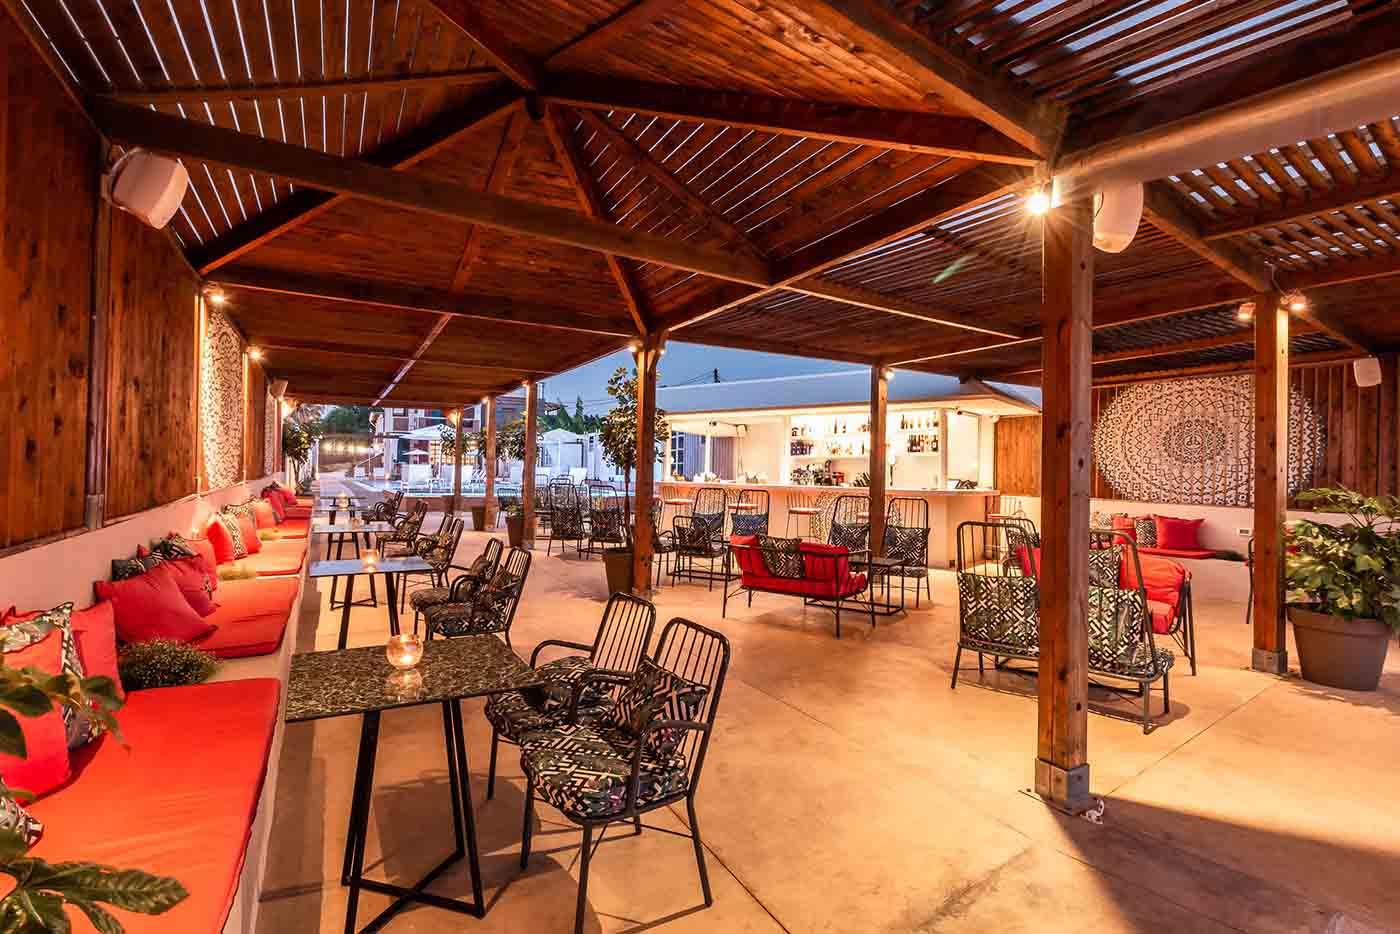 armeno lounge beach bar restaurant mykerkyra.com Marathias cocktails